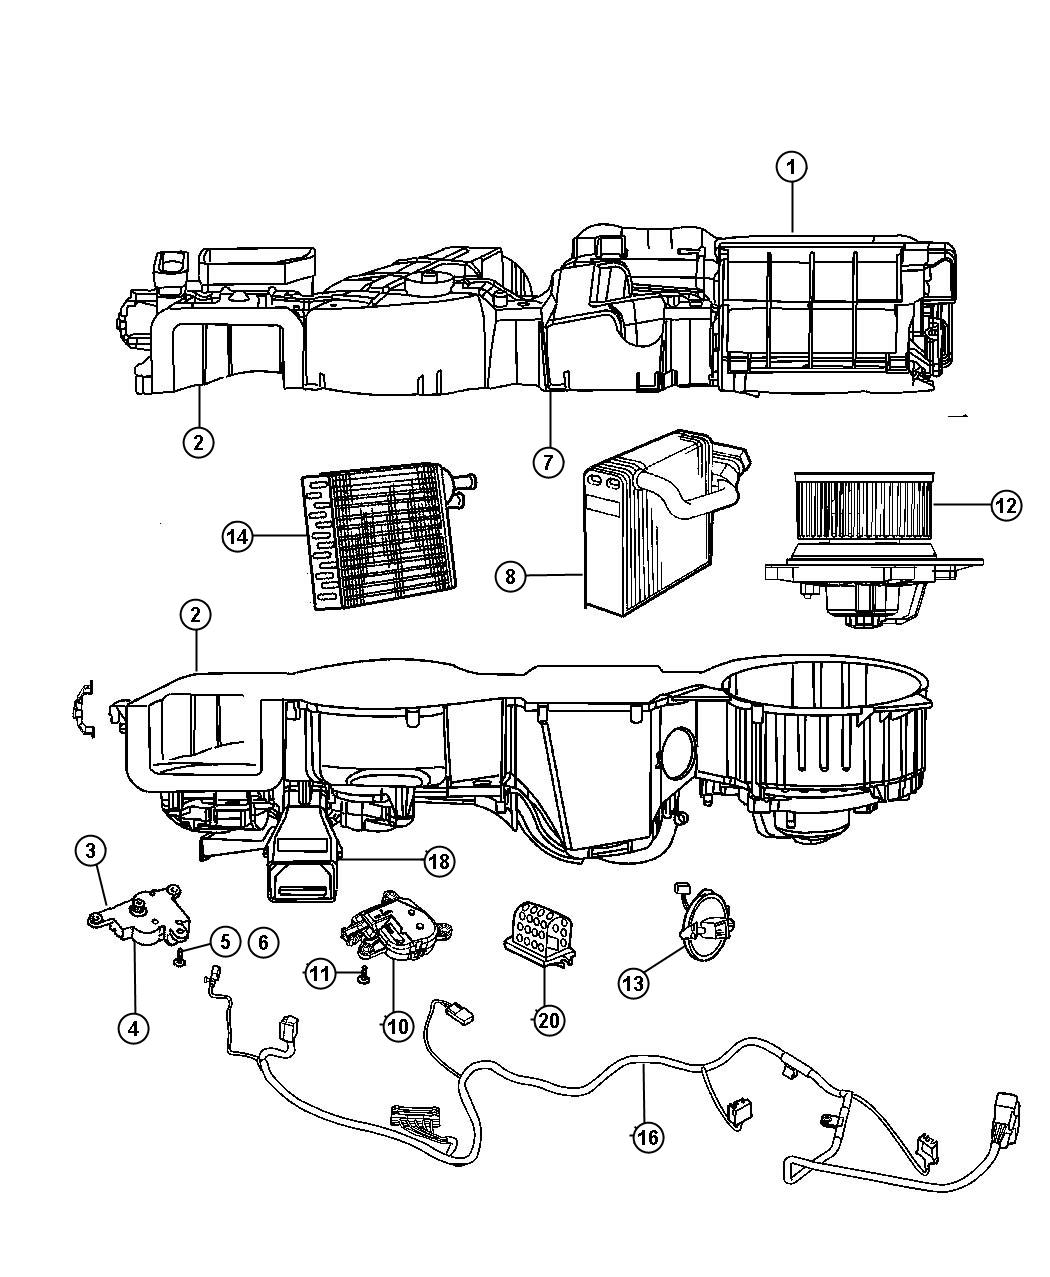 2009 Jeep Compass Actuator. Mode control. Air